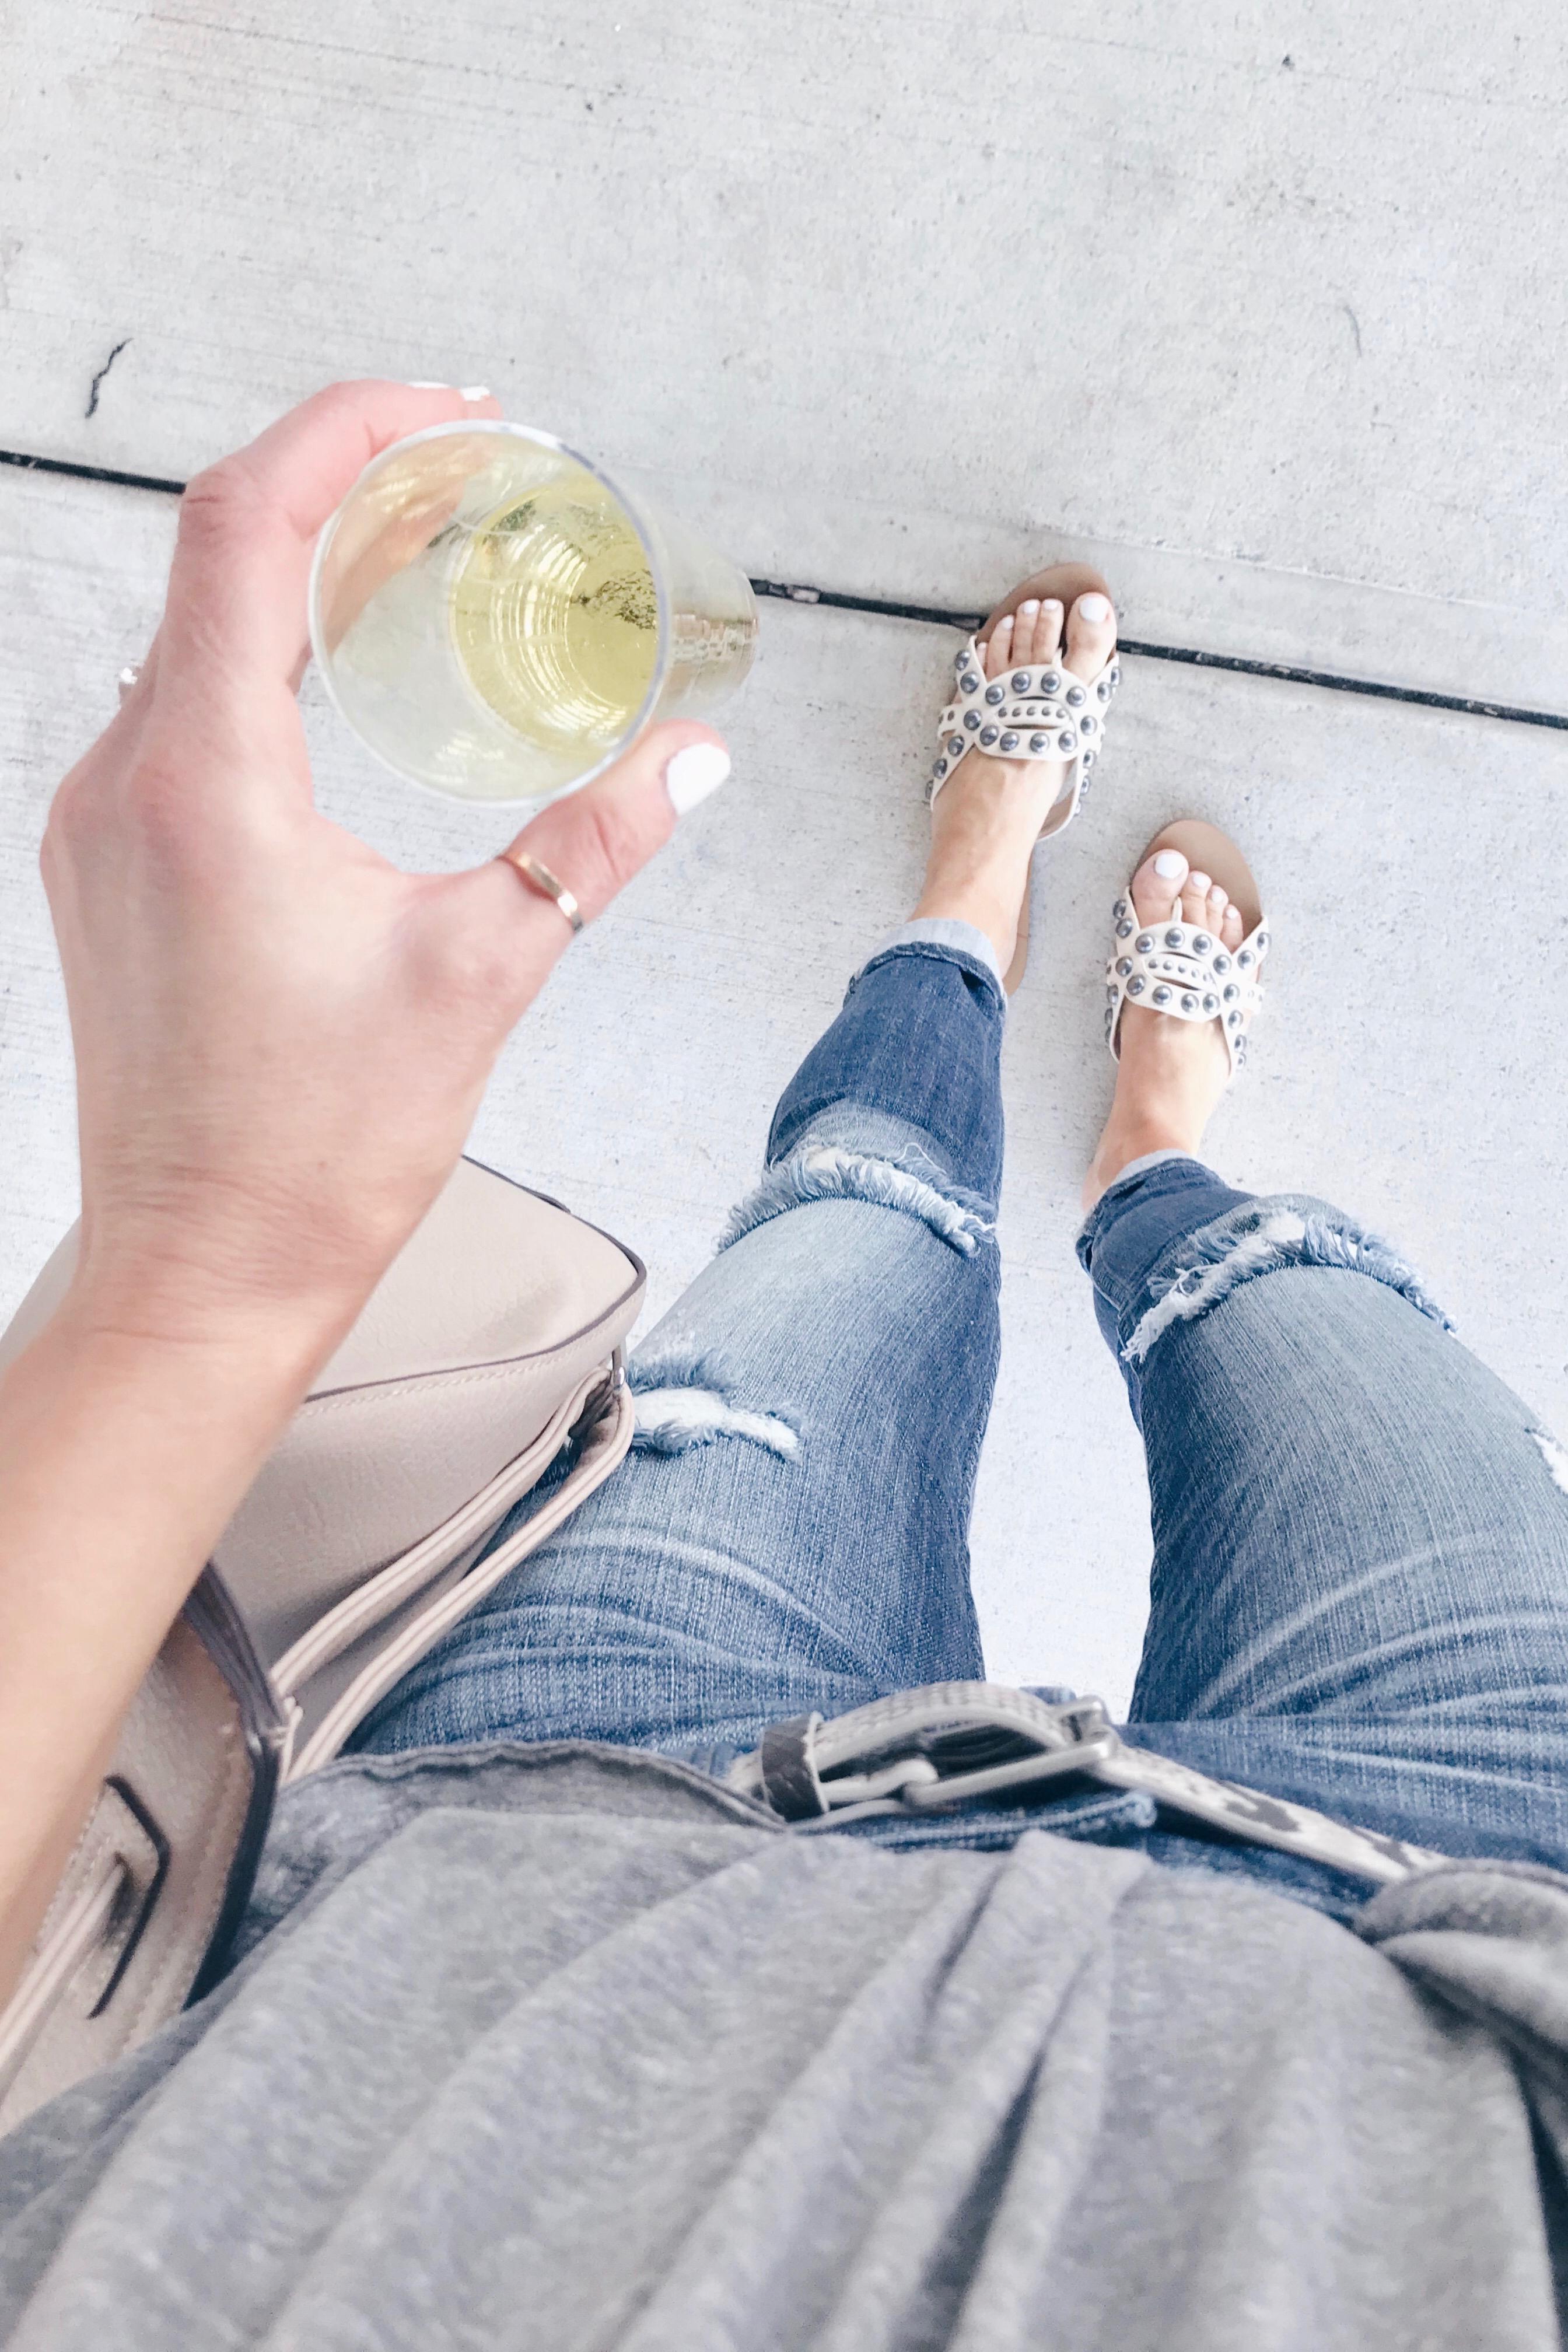 top spring outfits and easter weekend sales - embeliished white flip flips - pinteresting plans blog